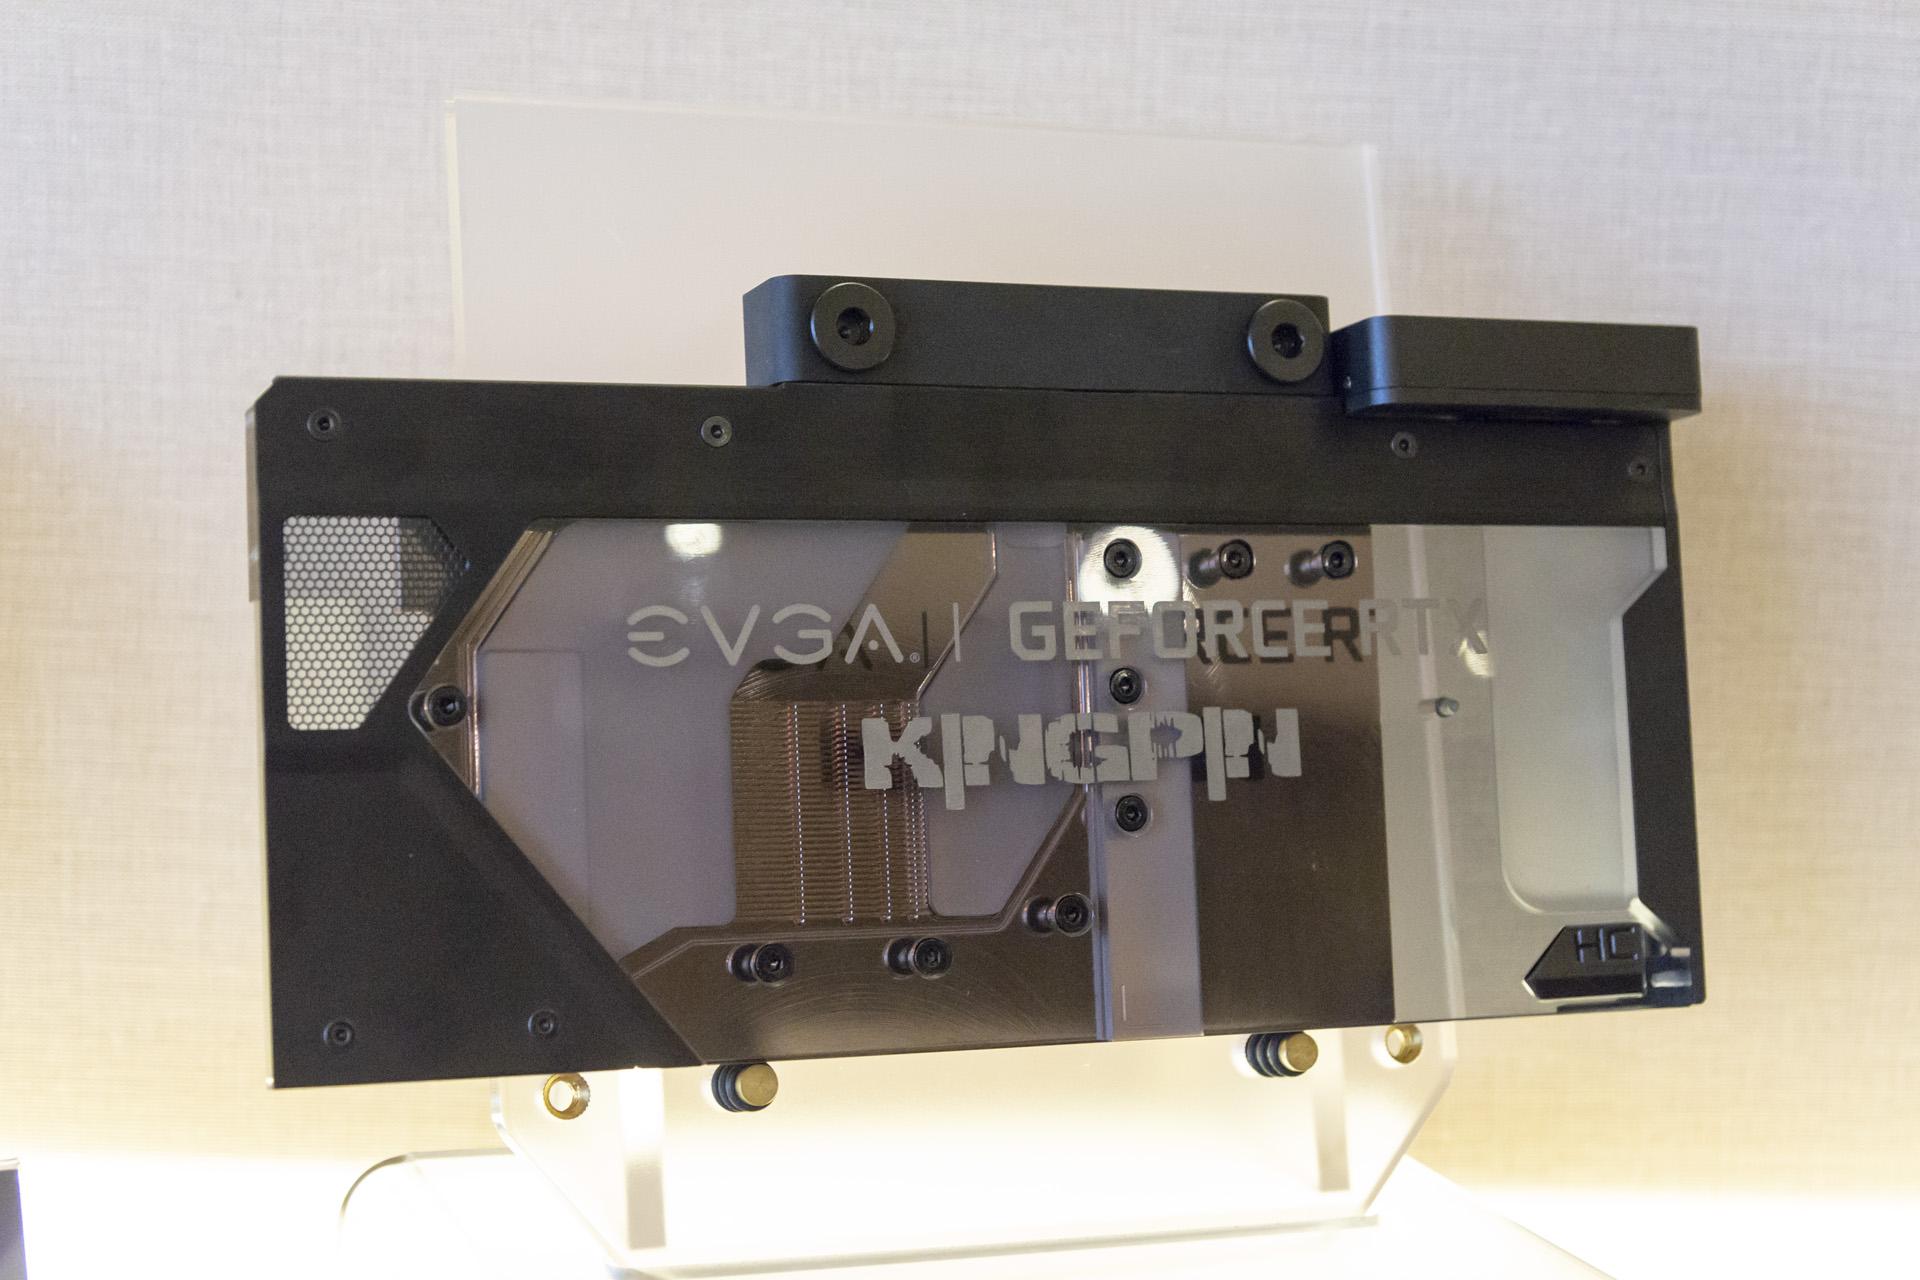 EVGA shows off monstrous SR-3 Dark motherboard | bit-tech net